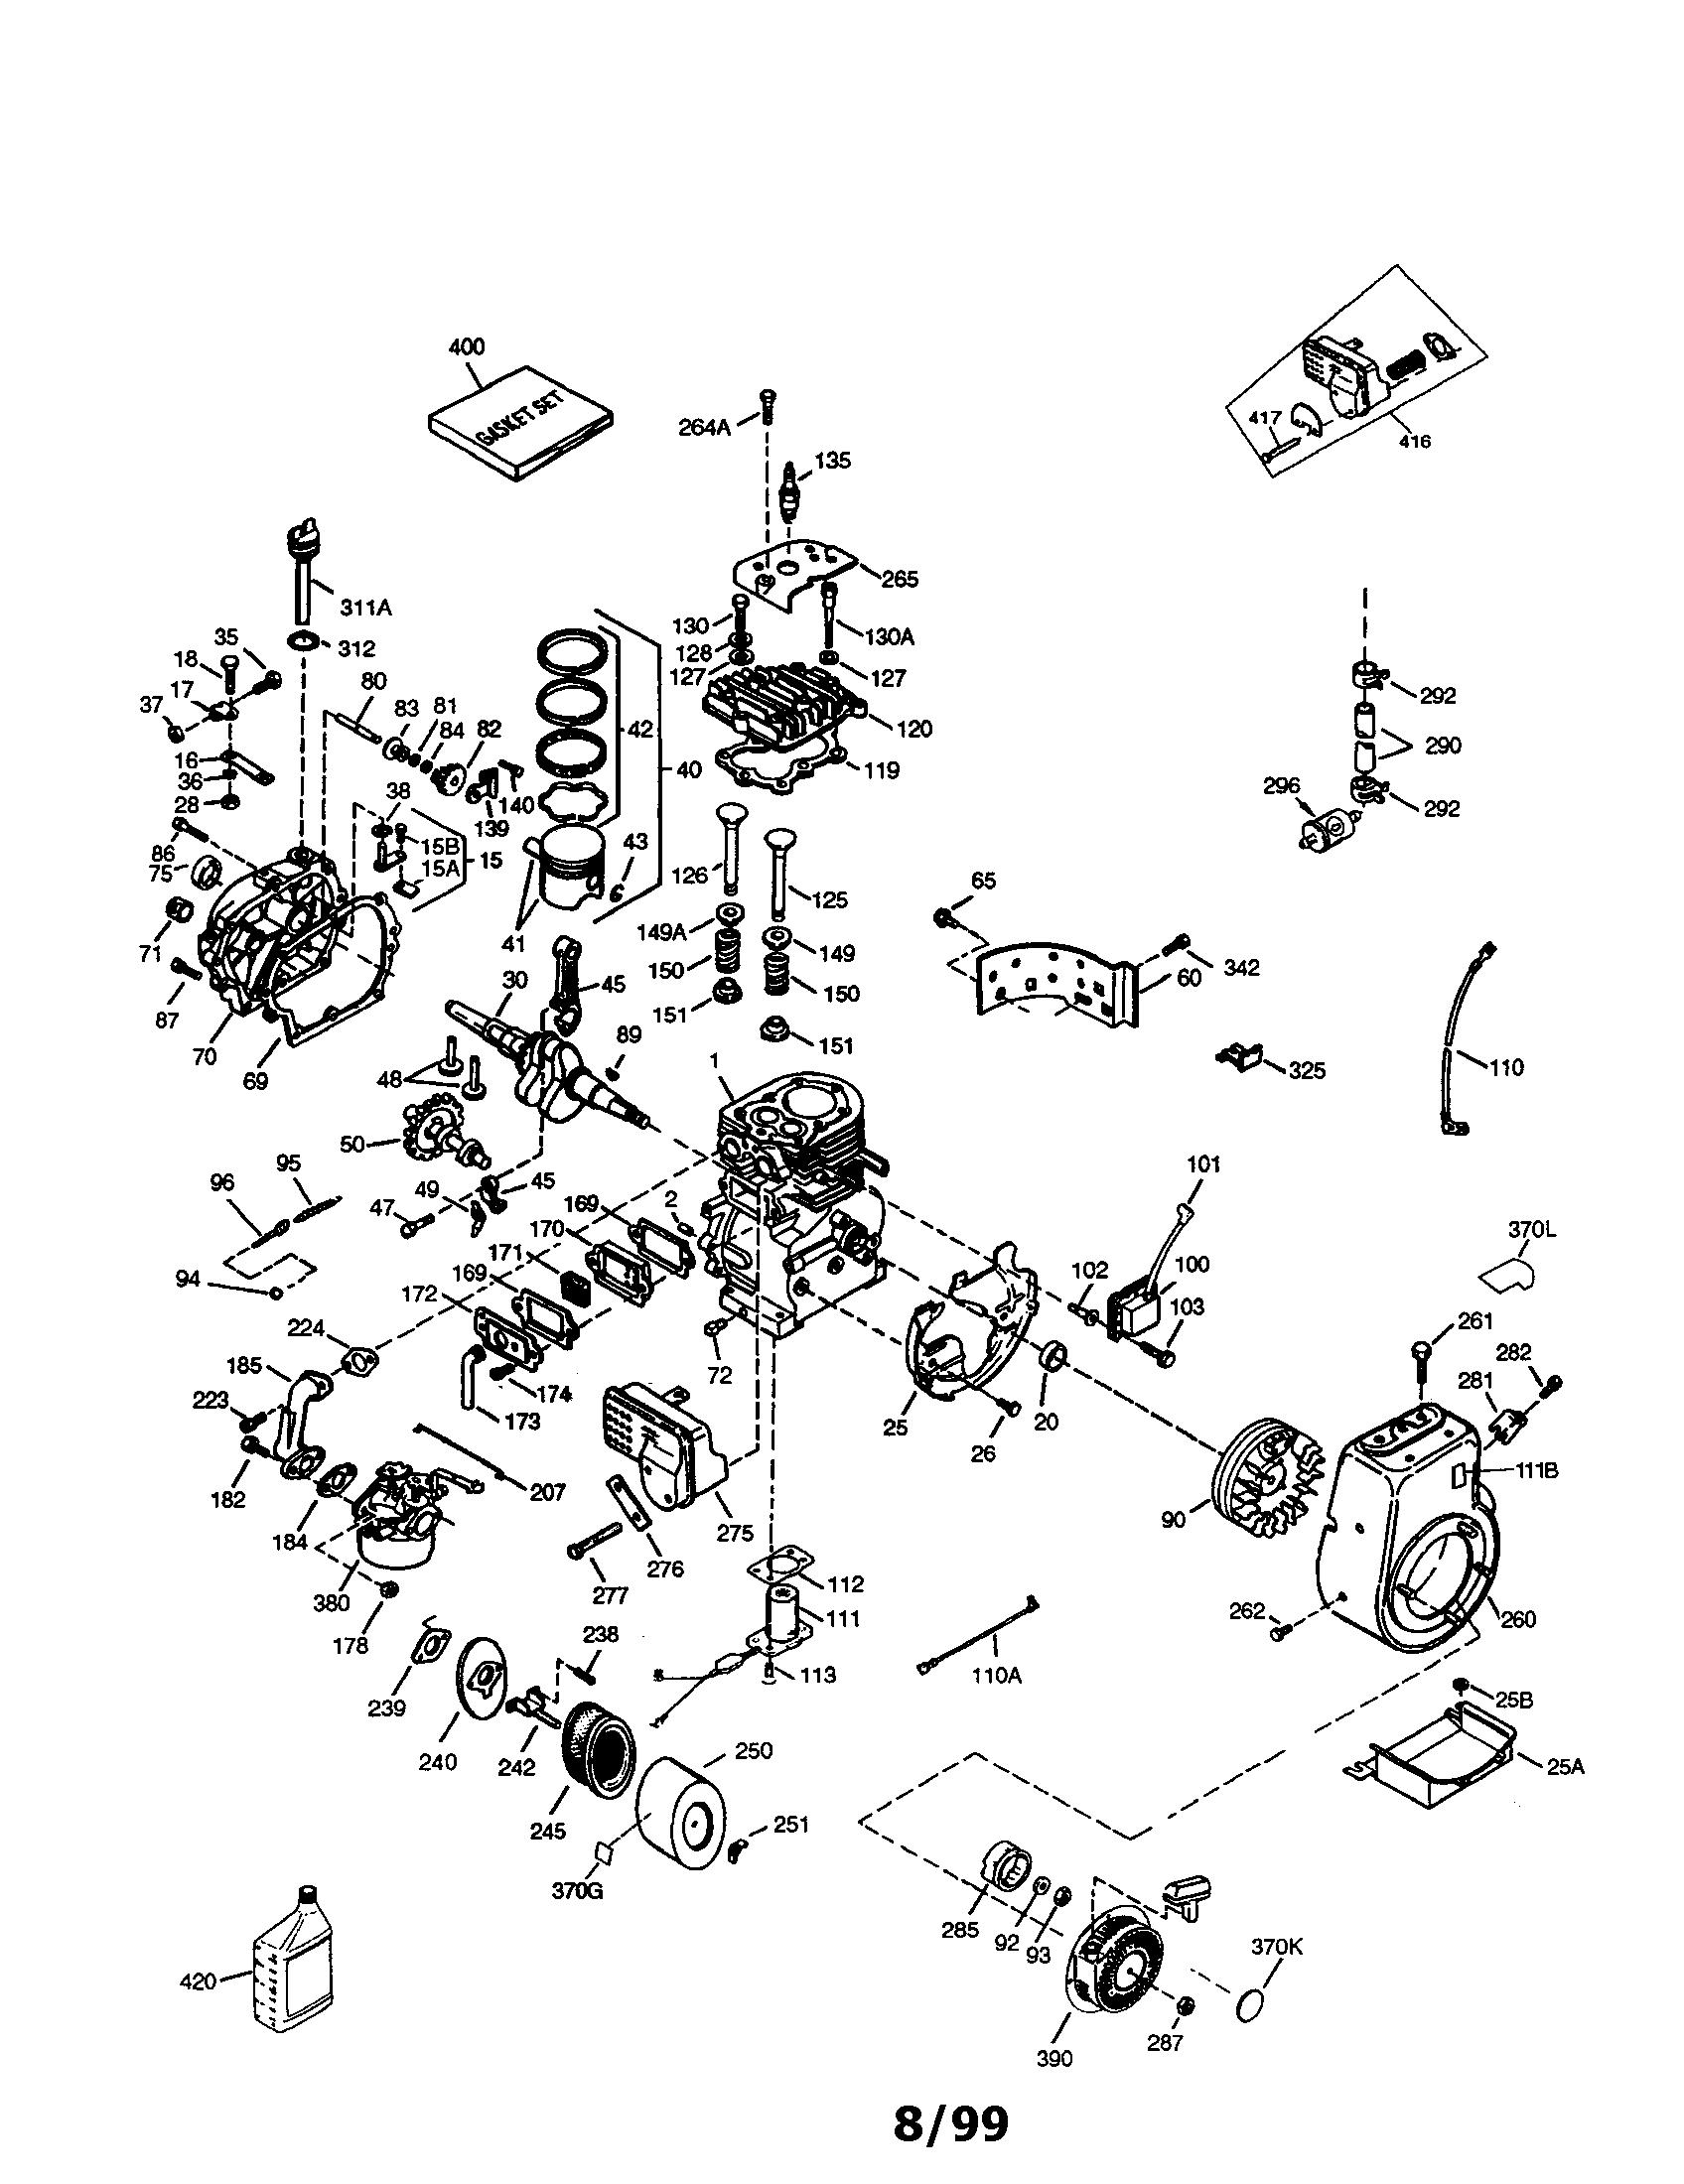 hight resolution of tecumseh model hm100 159409p engine genuine parts rh searspartsdirect com tecumseh engine wiring diagram tecumseh engine diagram